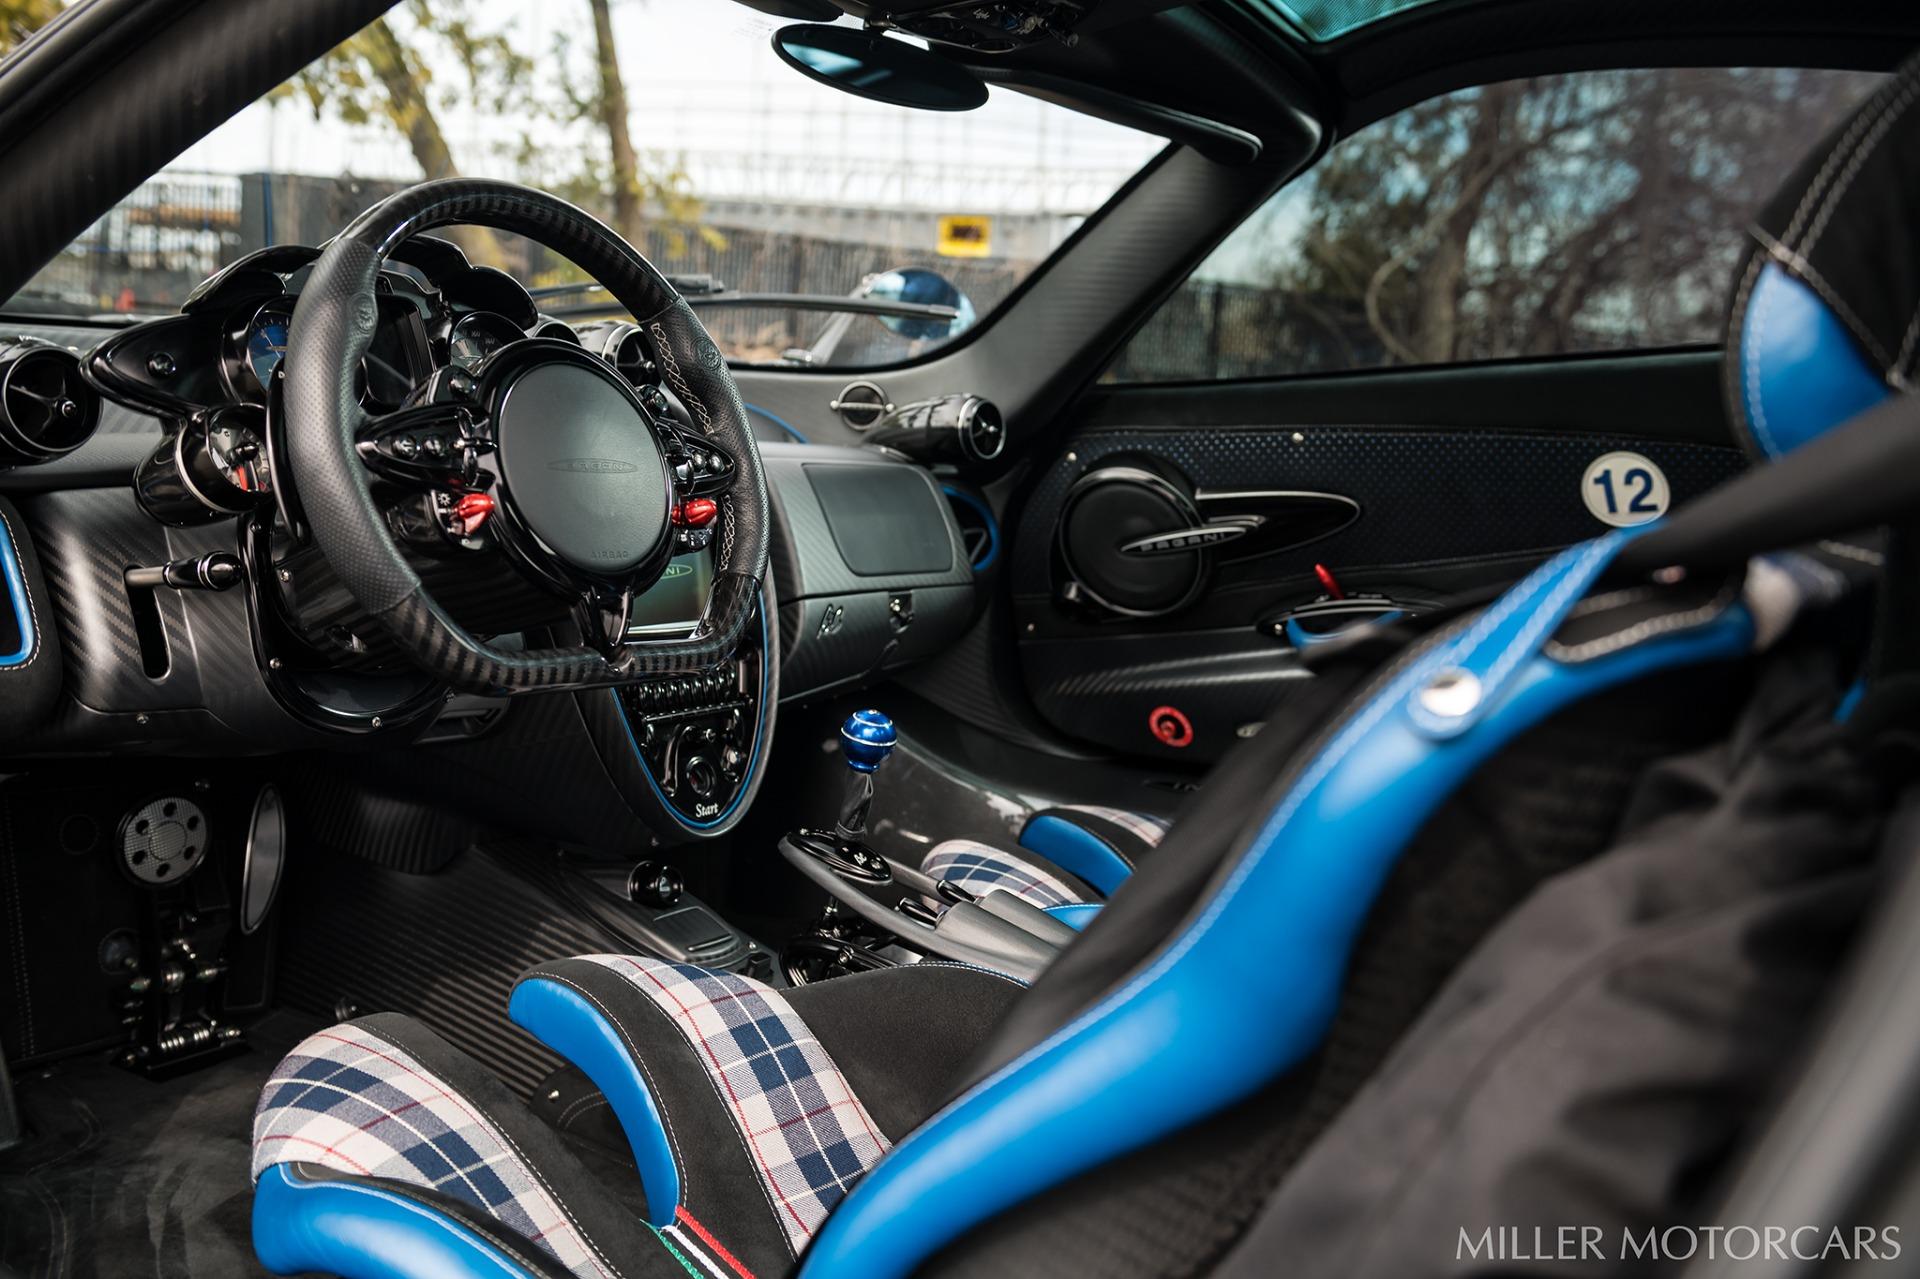 Used 2017 Pagani Huayra BC Macchina Volante For Sale In Greenwich, CT. Alfa Romeo of Greenwich, P34C 3051_p34